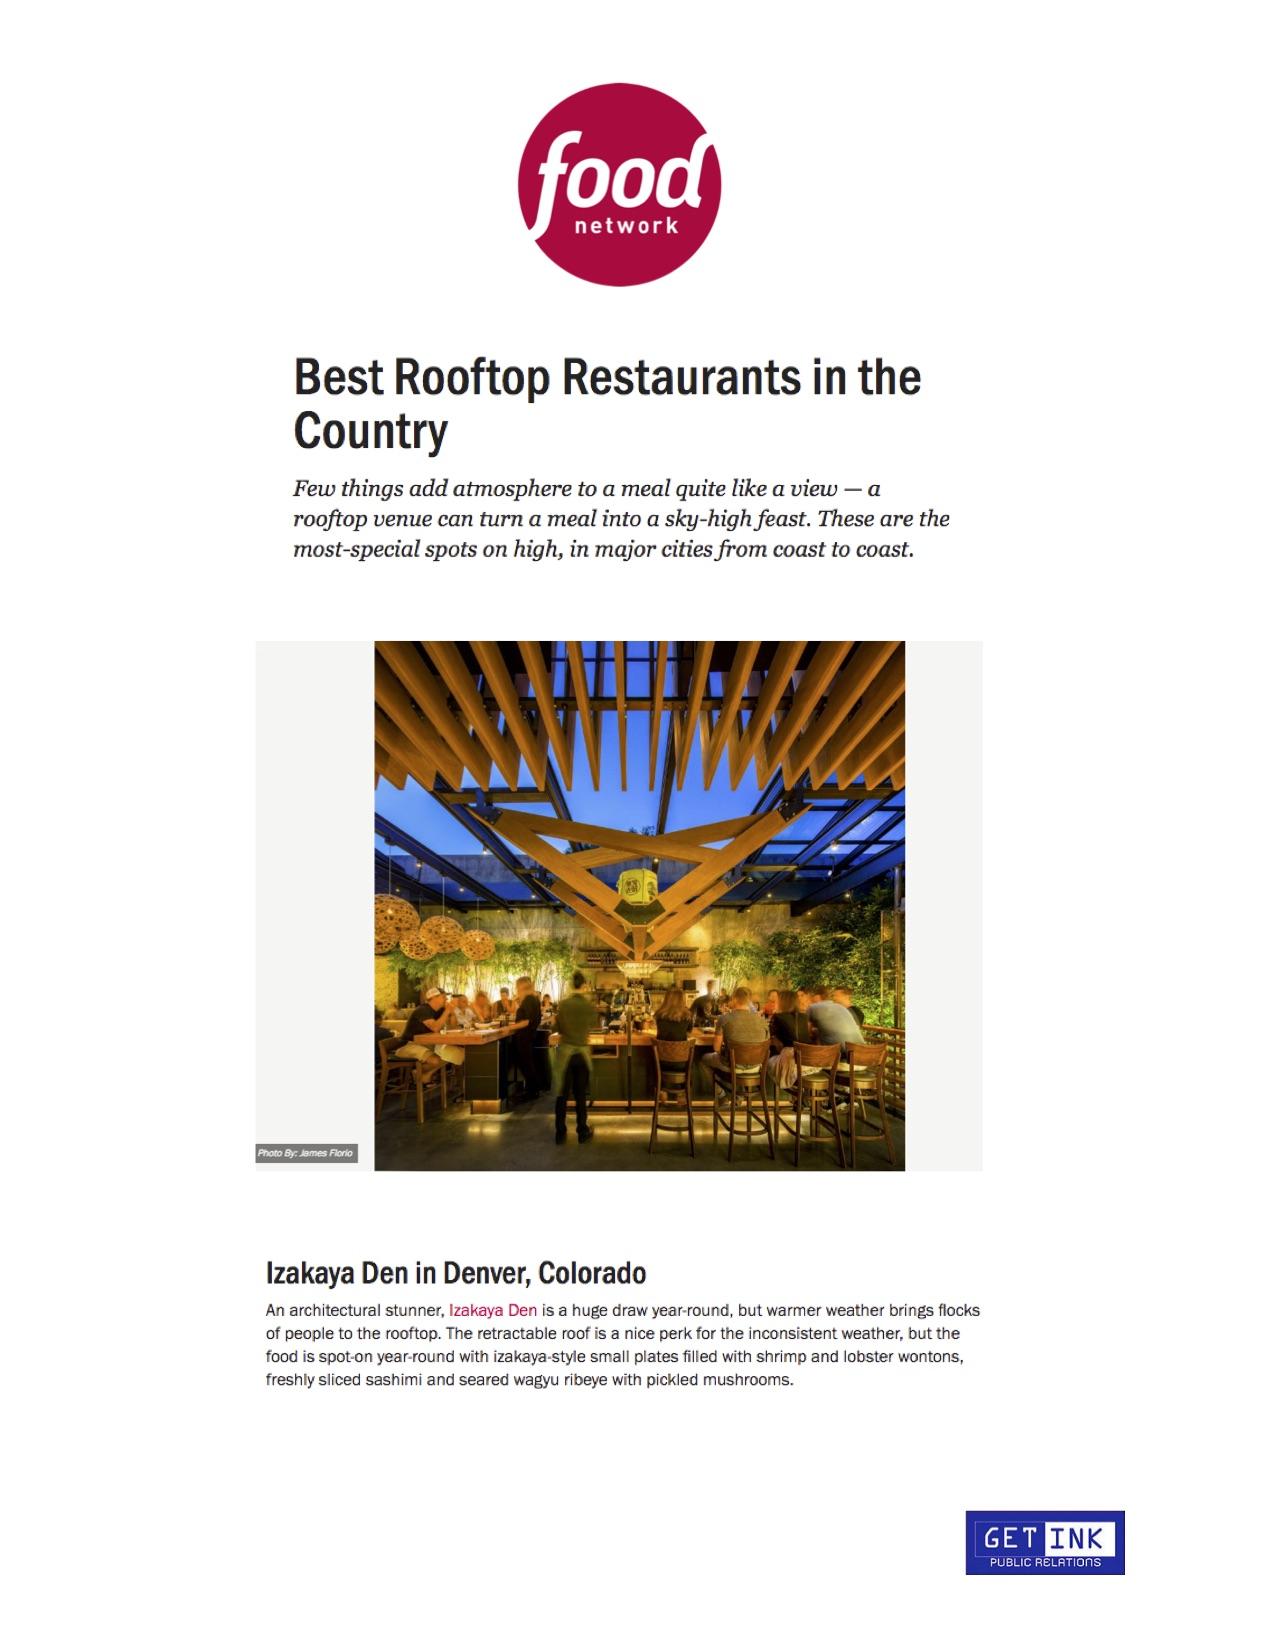 Izakaya Den Denver Best Rooftop Food Network - Get Ink PR